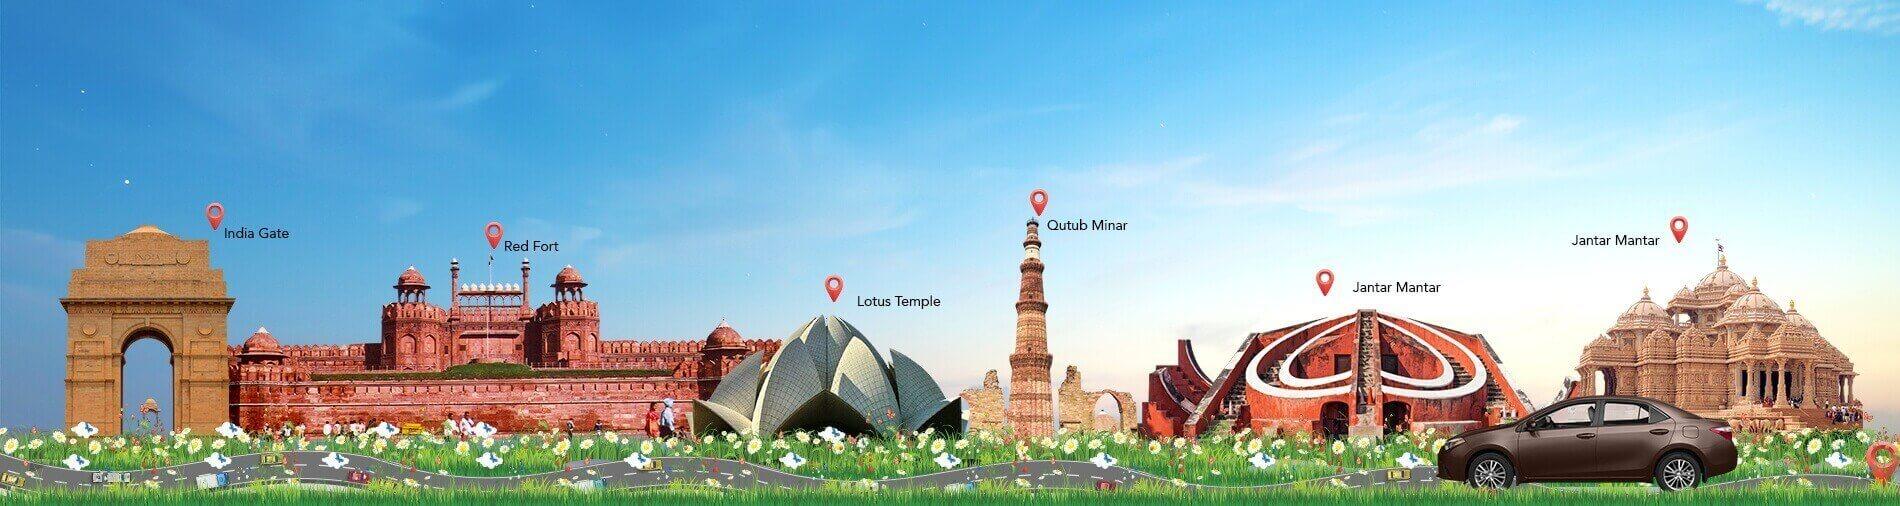 Self Drive Car Rental In Delhi Ncr Car Hire In Delhi Luxury Car